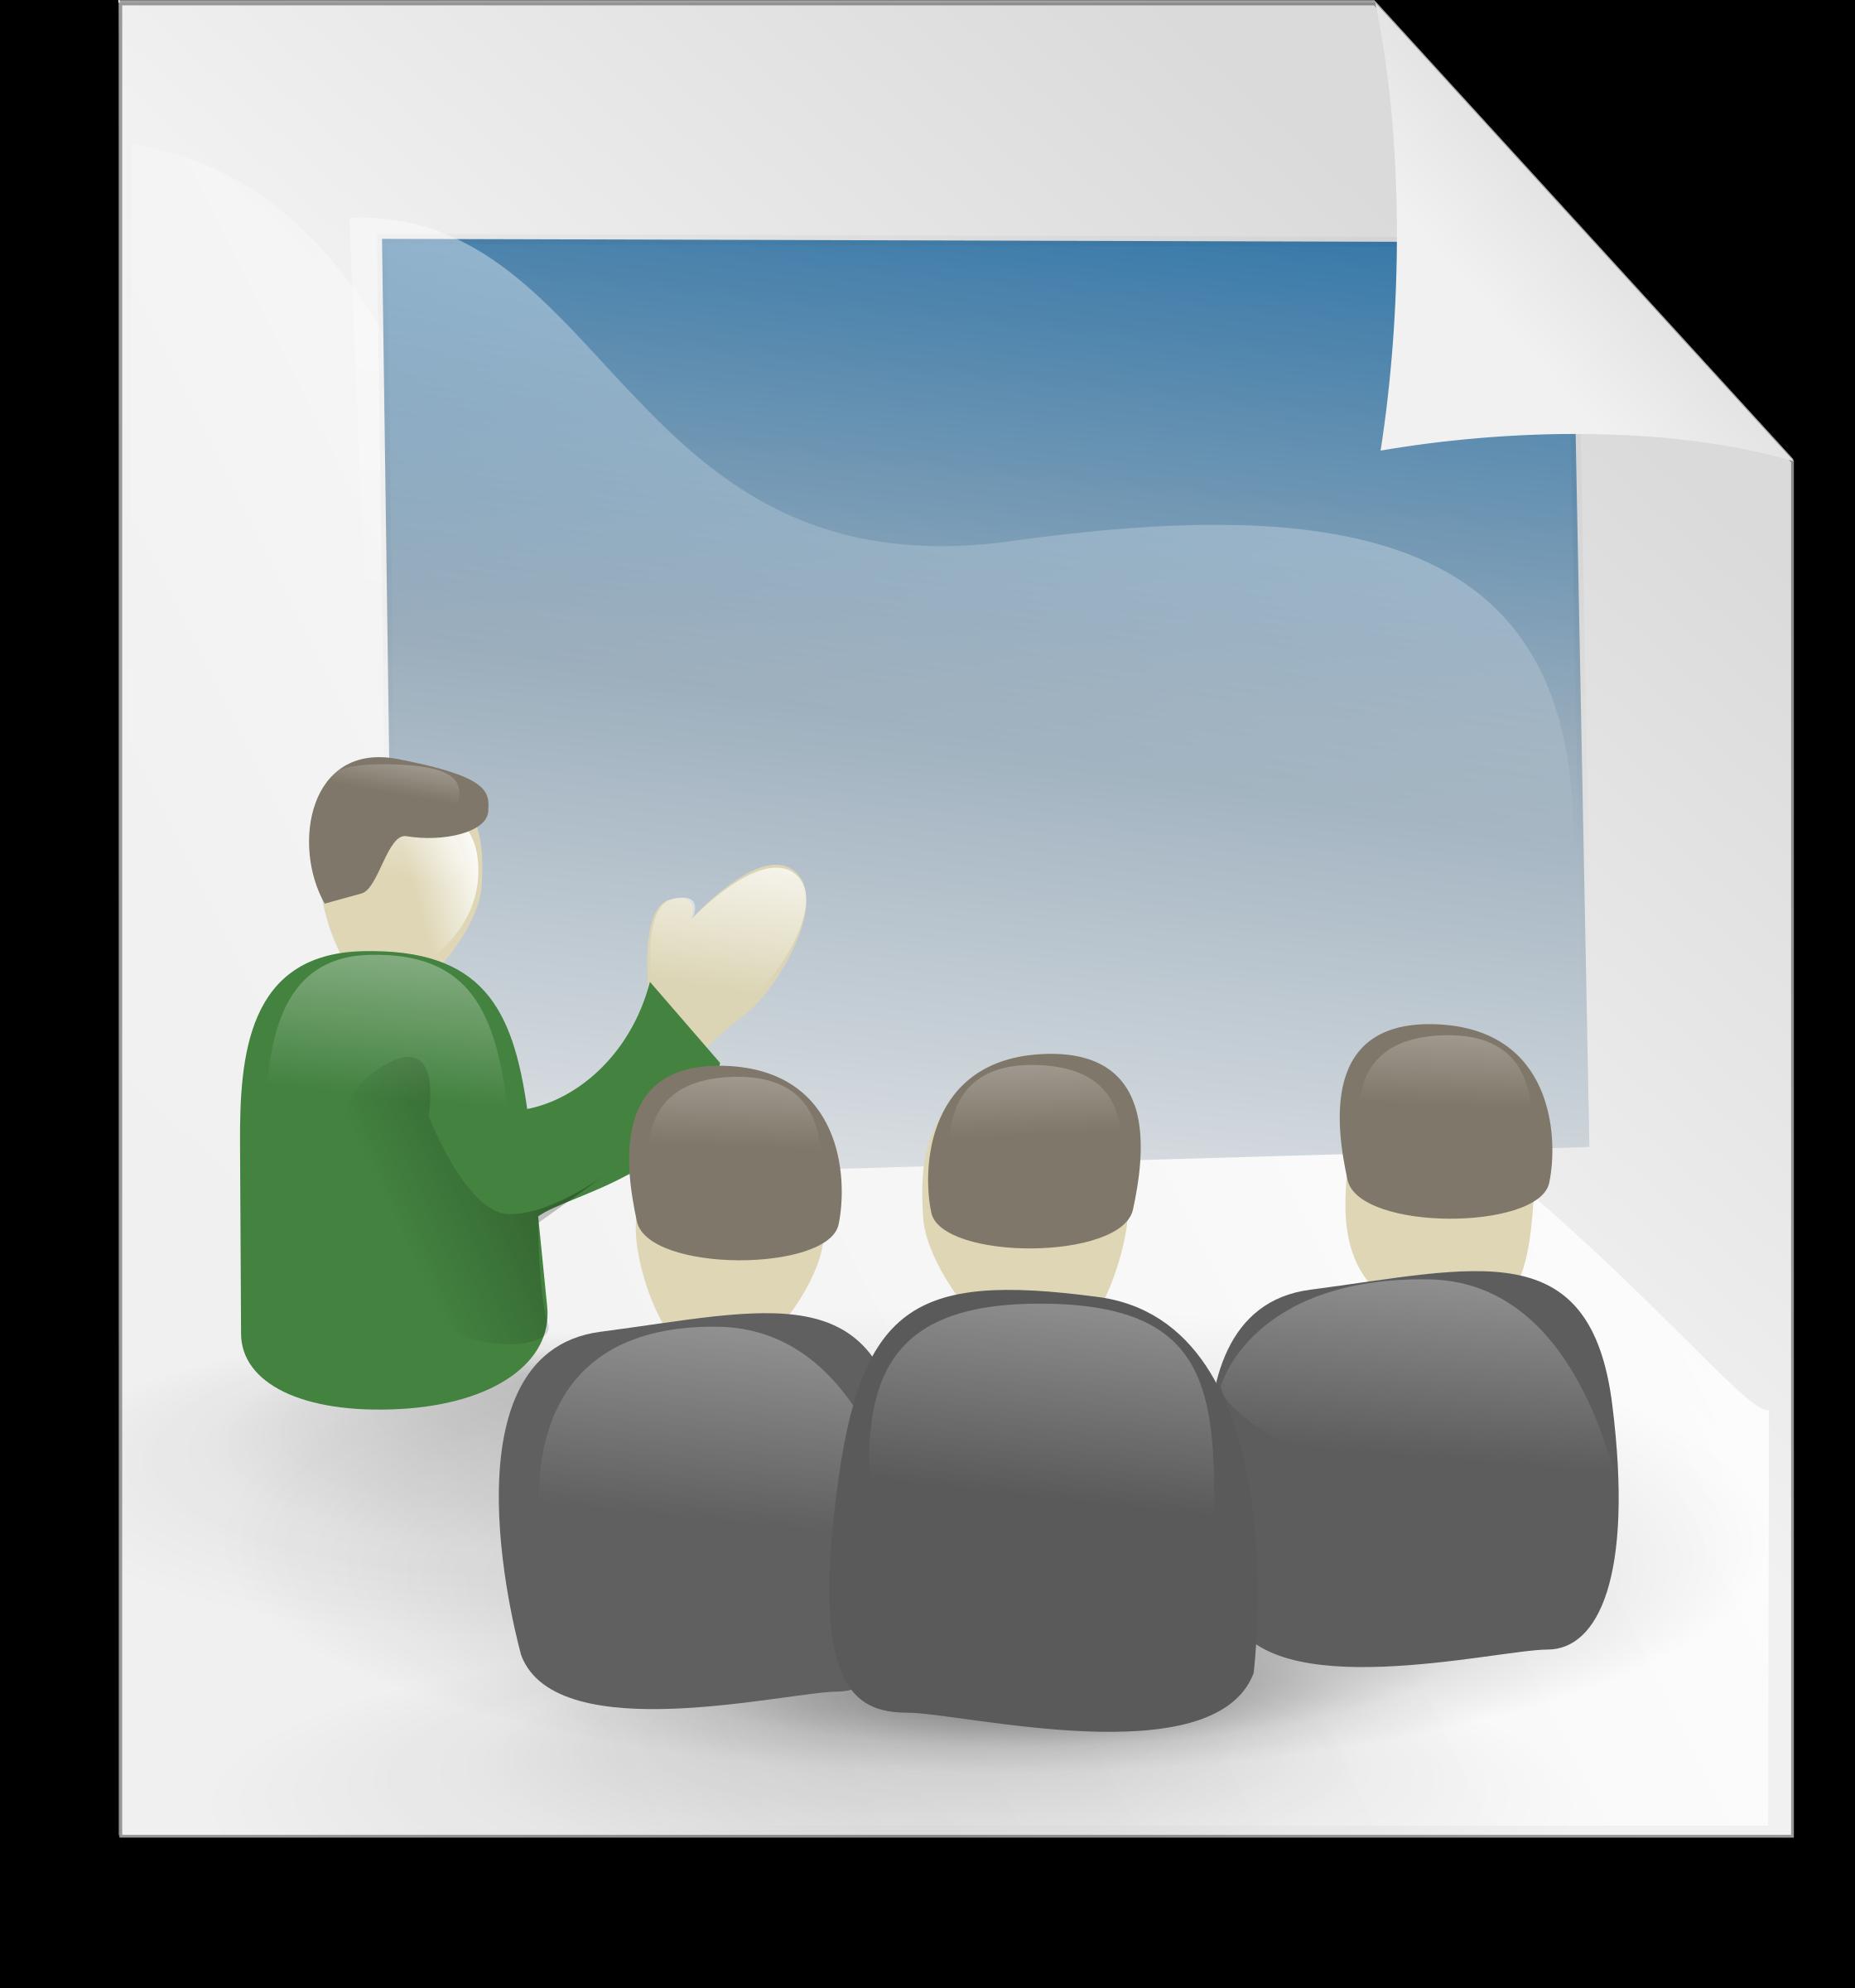 transparent stock Presentation clipart. Big image png.